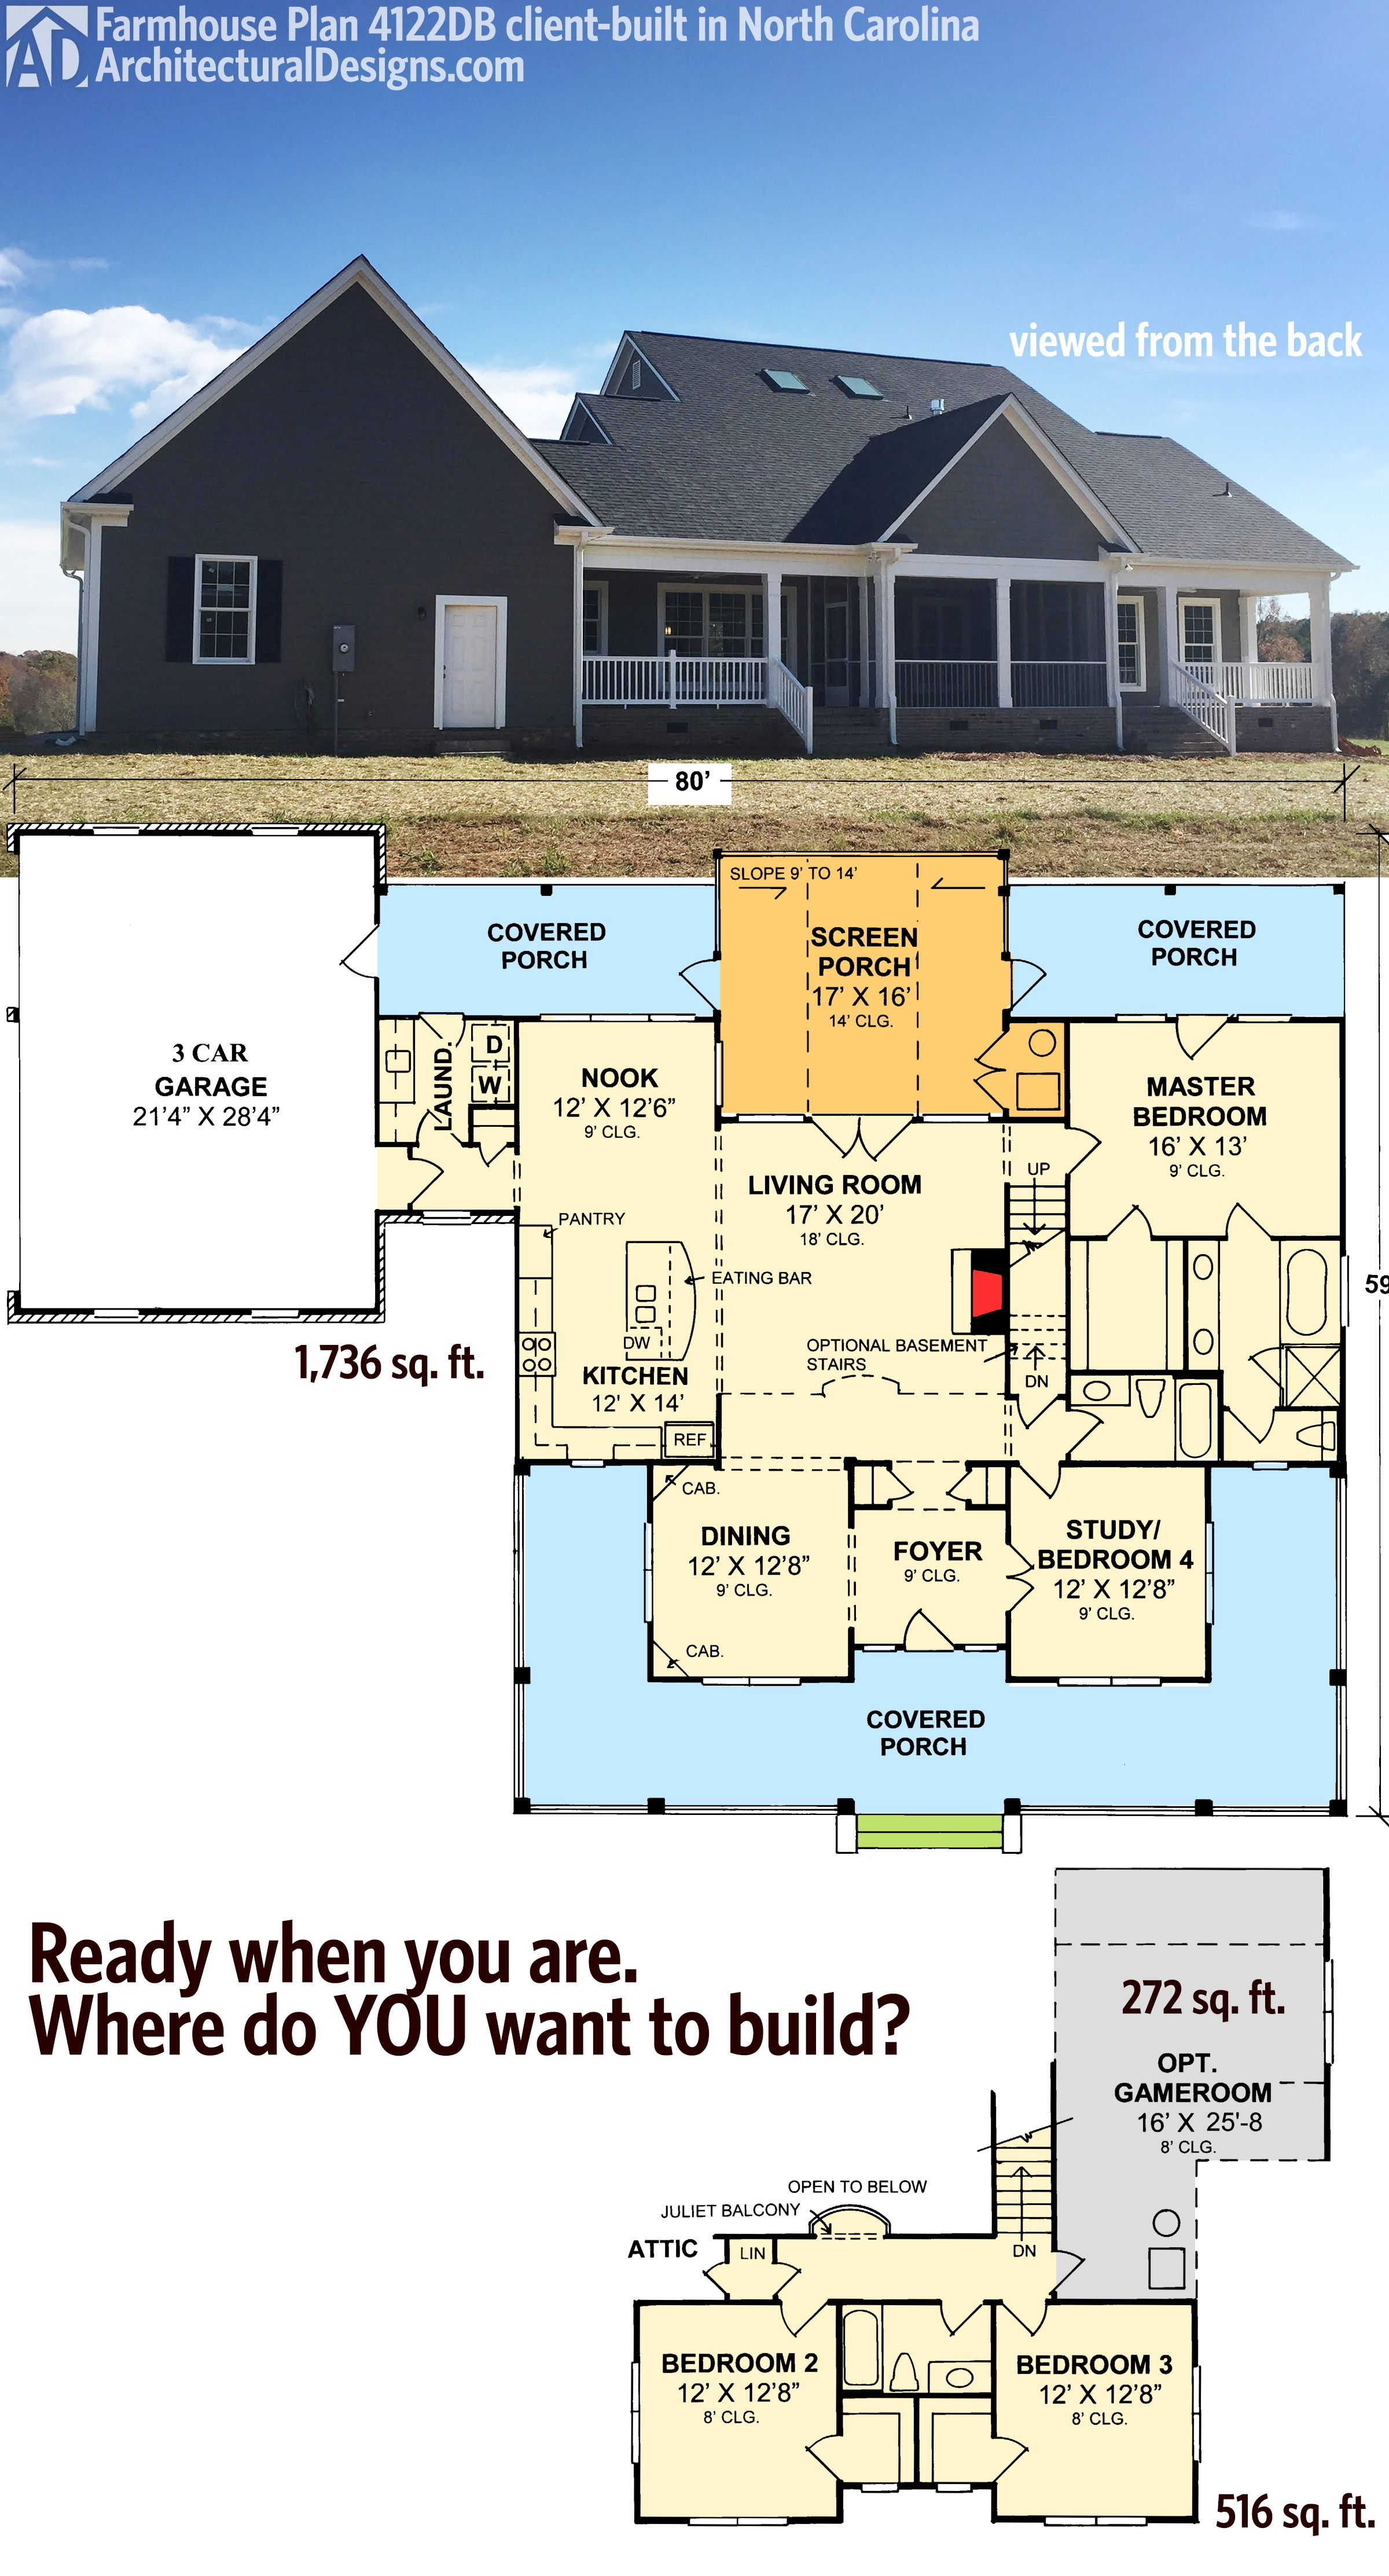 Plan 4122WM: Country Home Plan With Marvelous Porches | Farmhouse ...